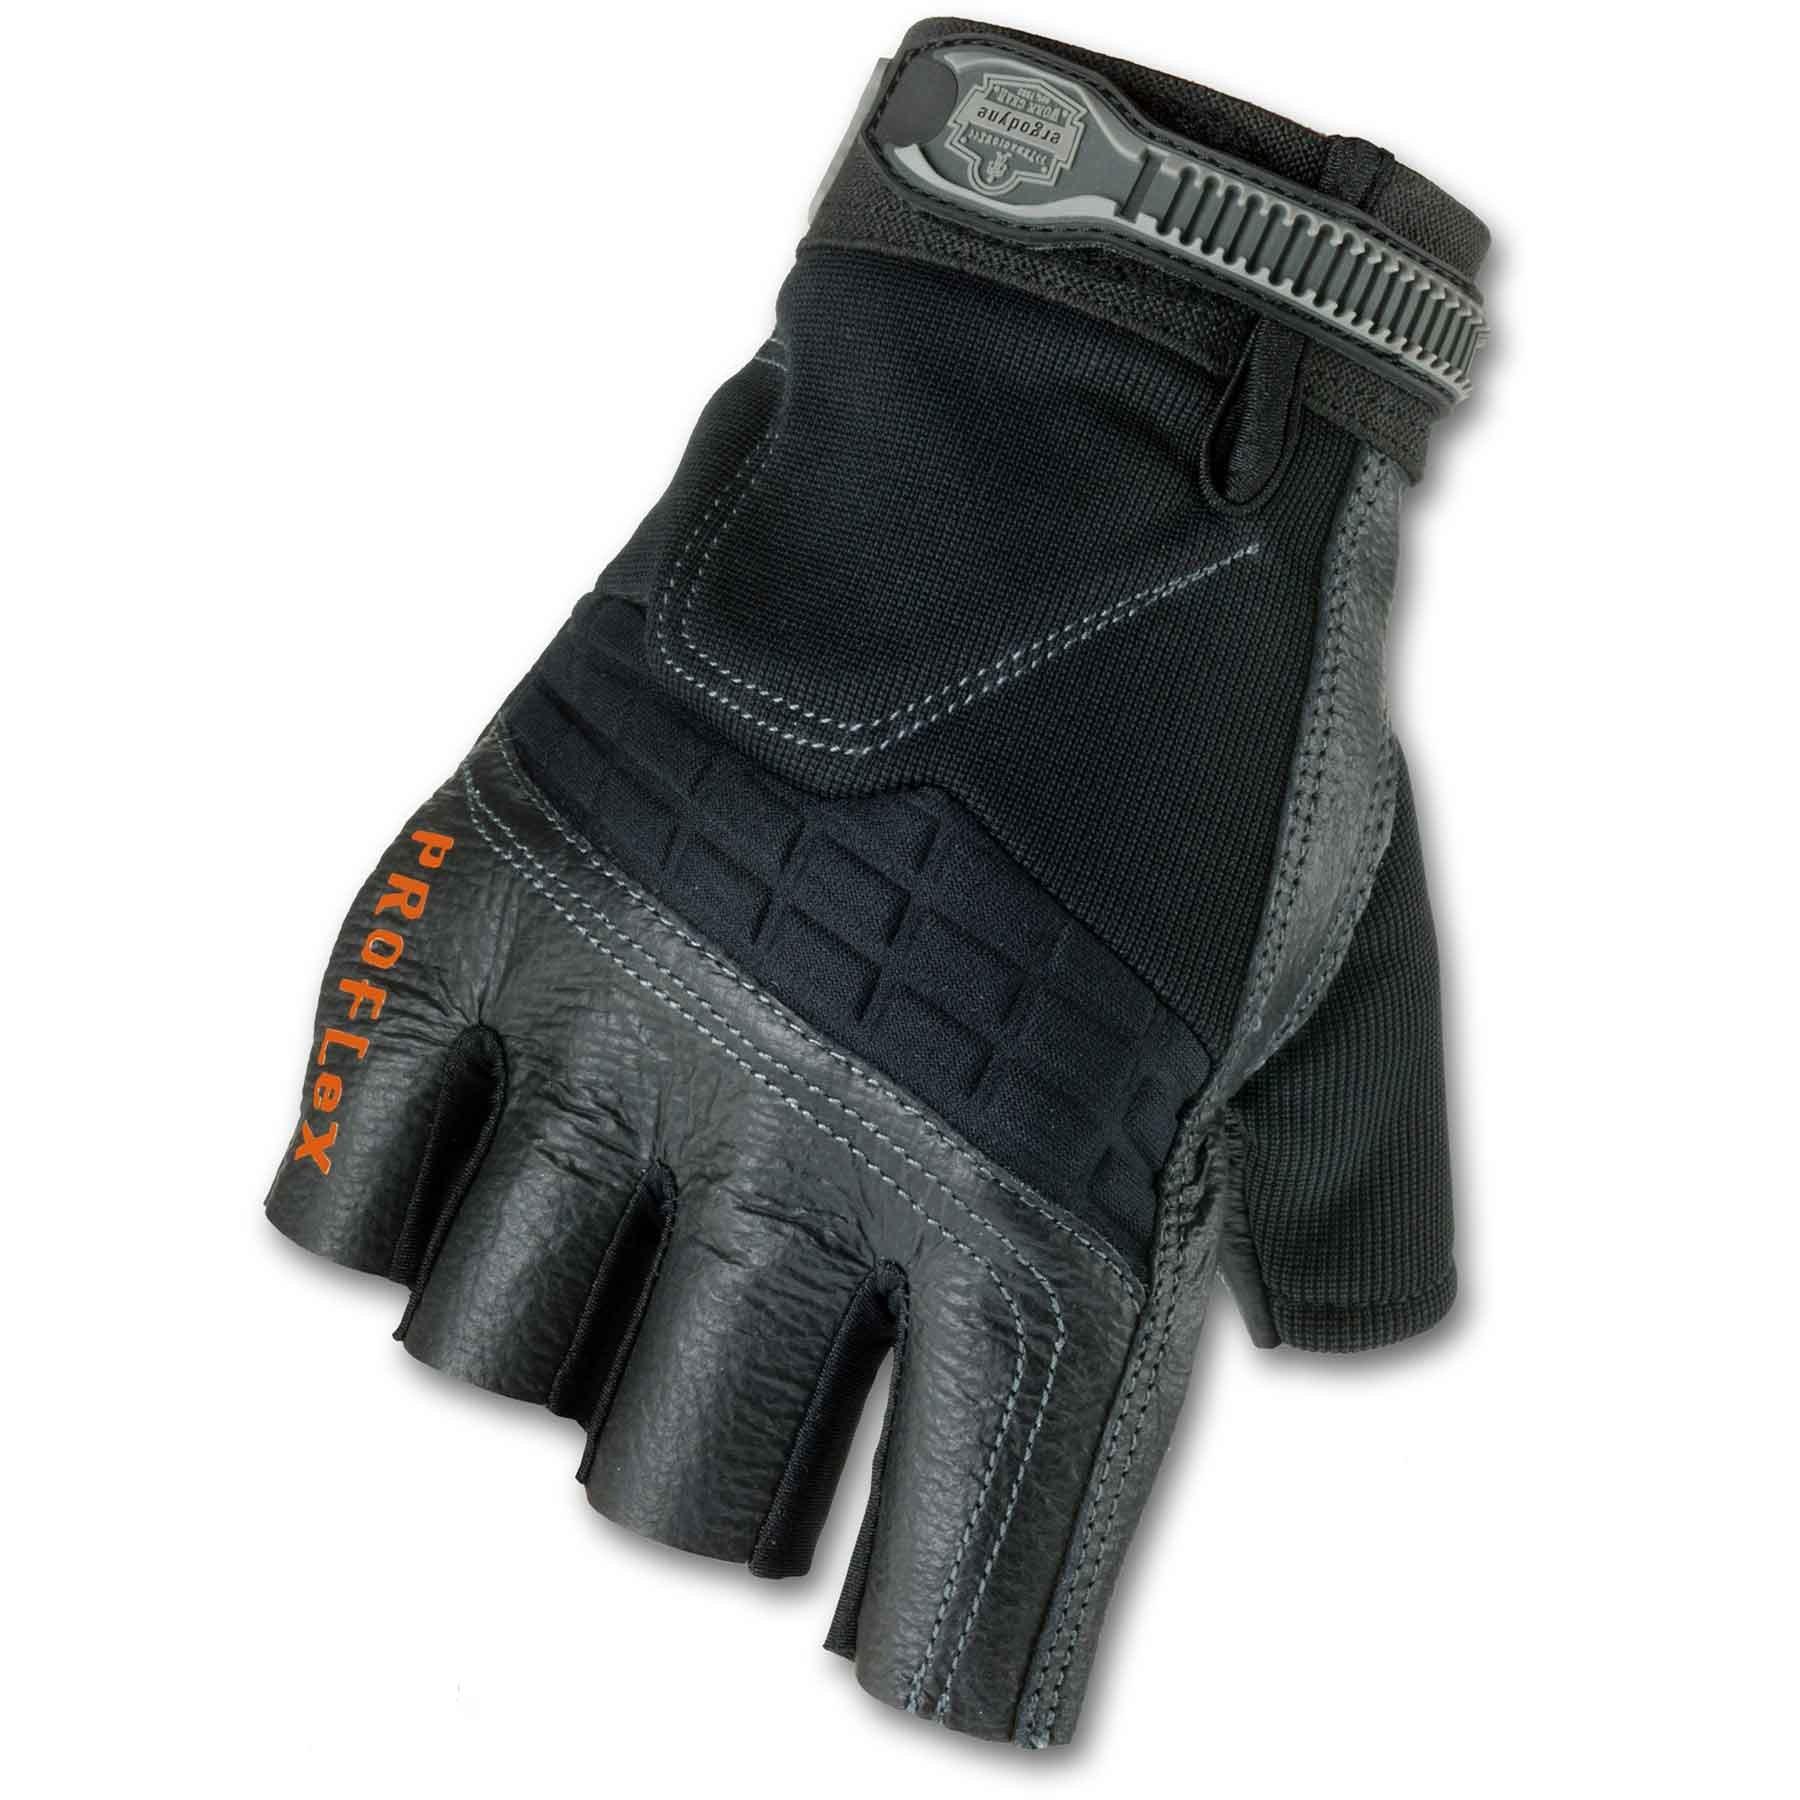 Ergodyne ProFlex 900 Impact-Reducing Half-Fingered Work Gloves, Small